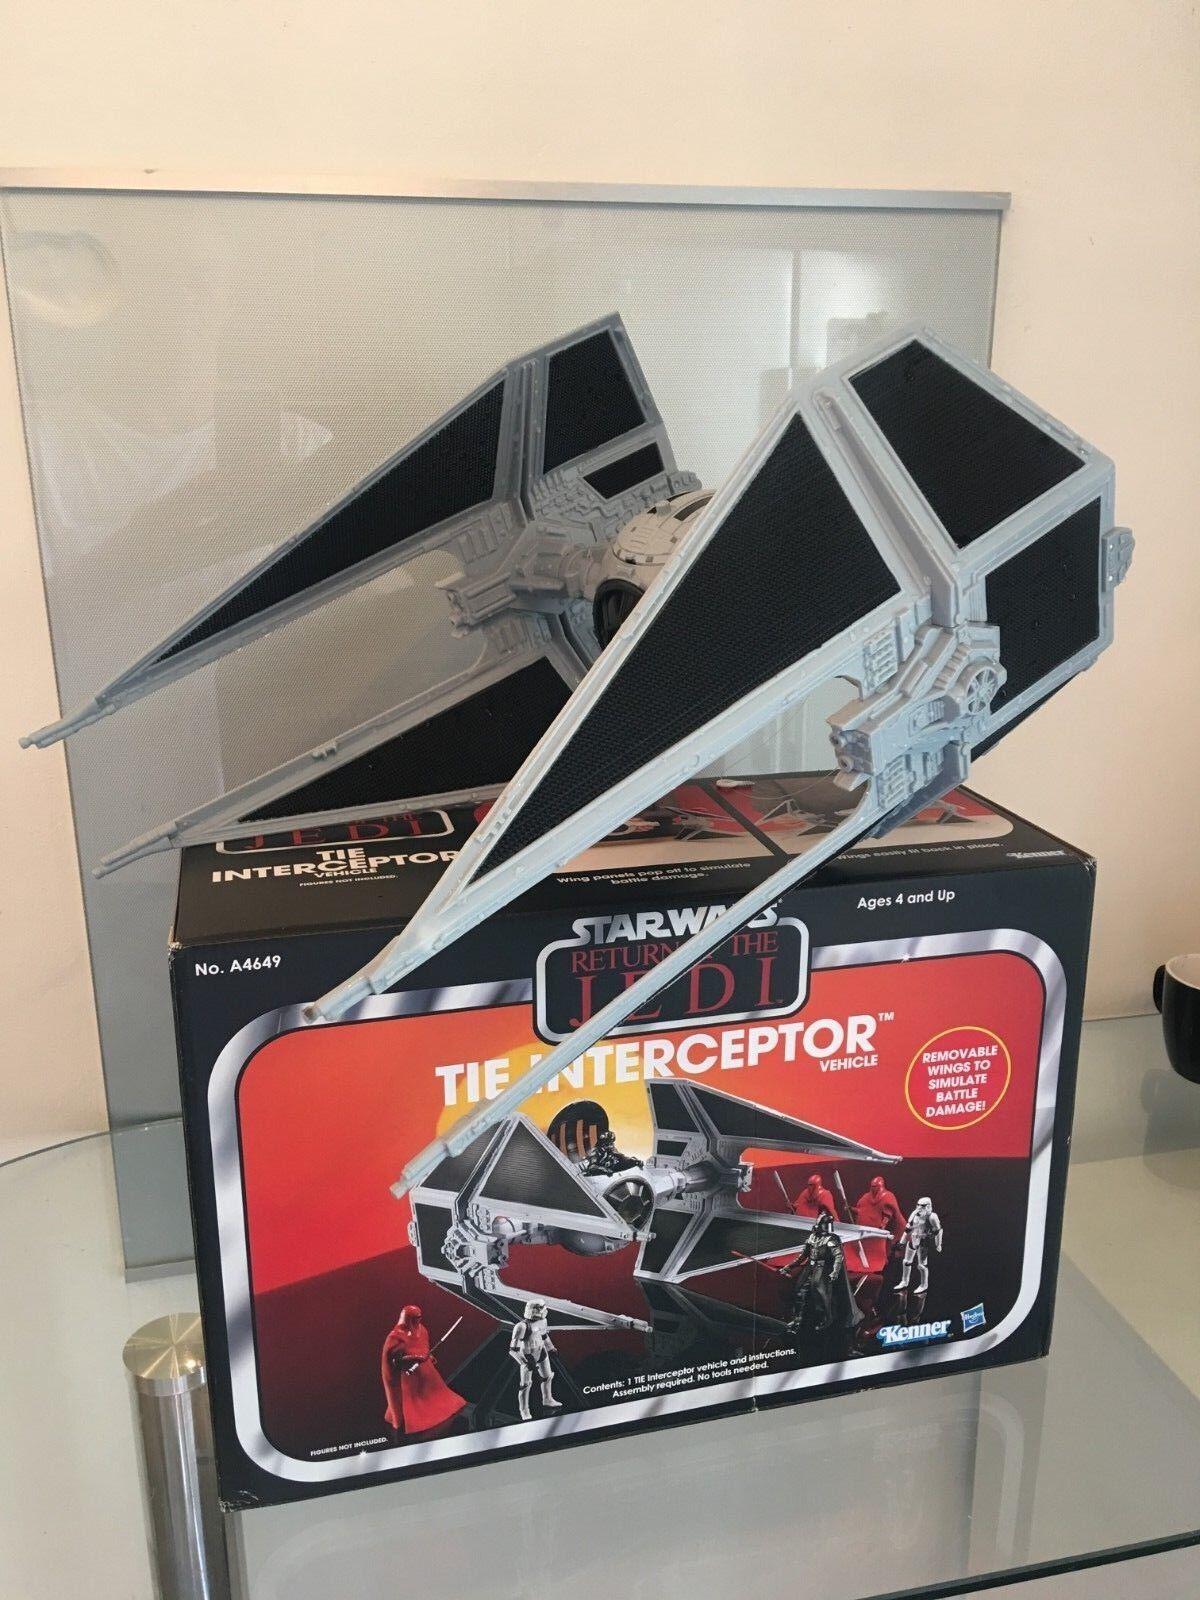 Star Wars Tie Interceptor Vintage Collection - Brand NEW Boxed